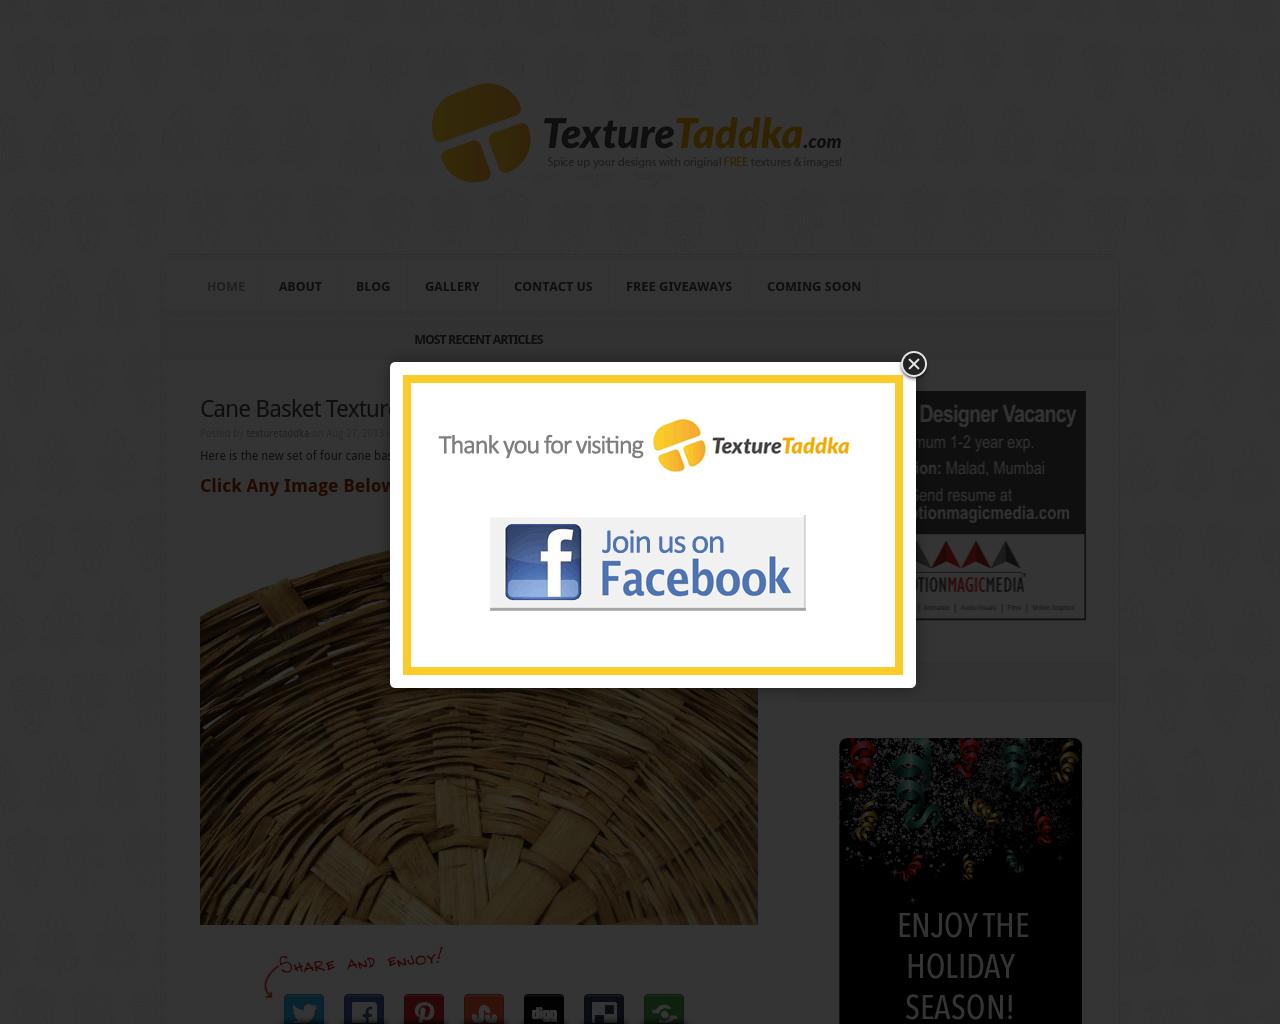 TextureTaddka.com-Advertising-Reviews-Pricing